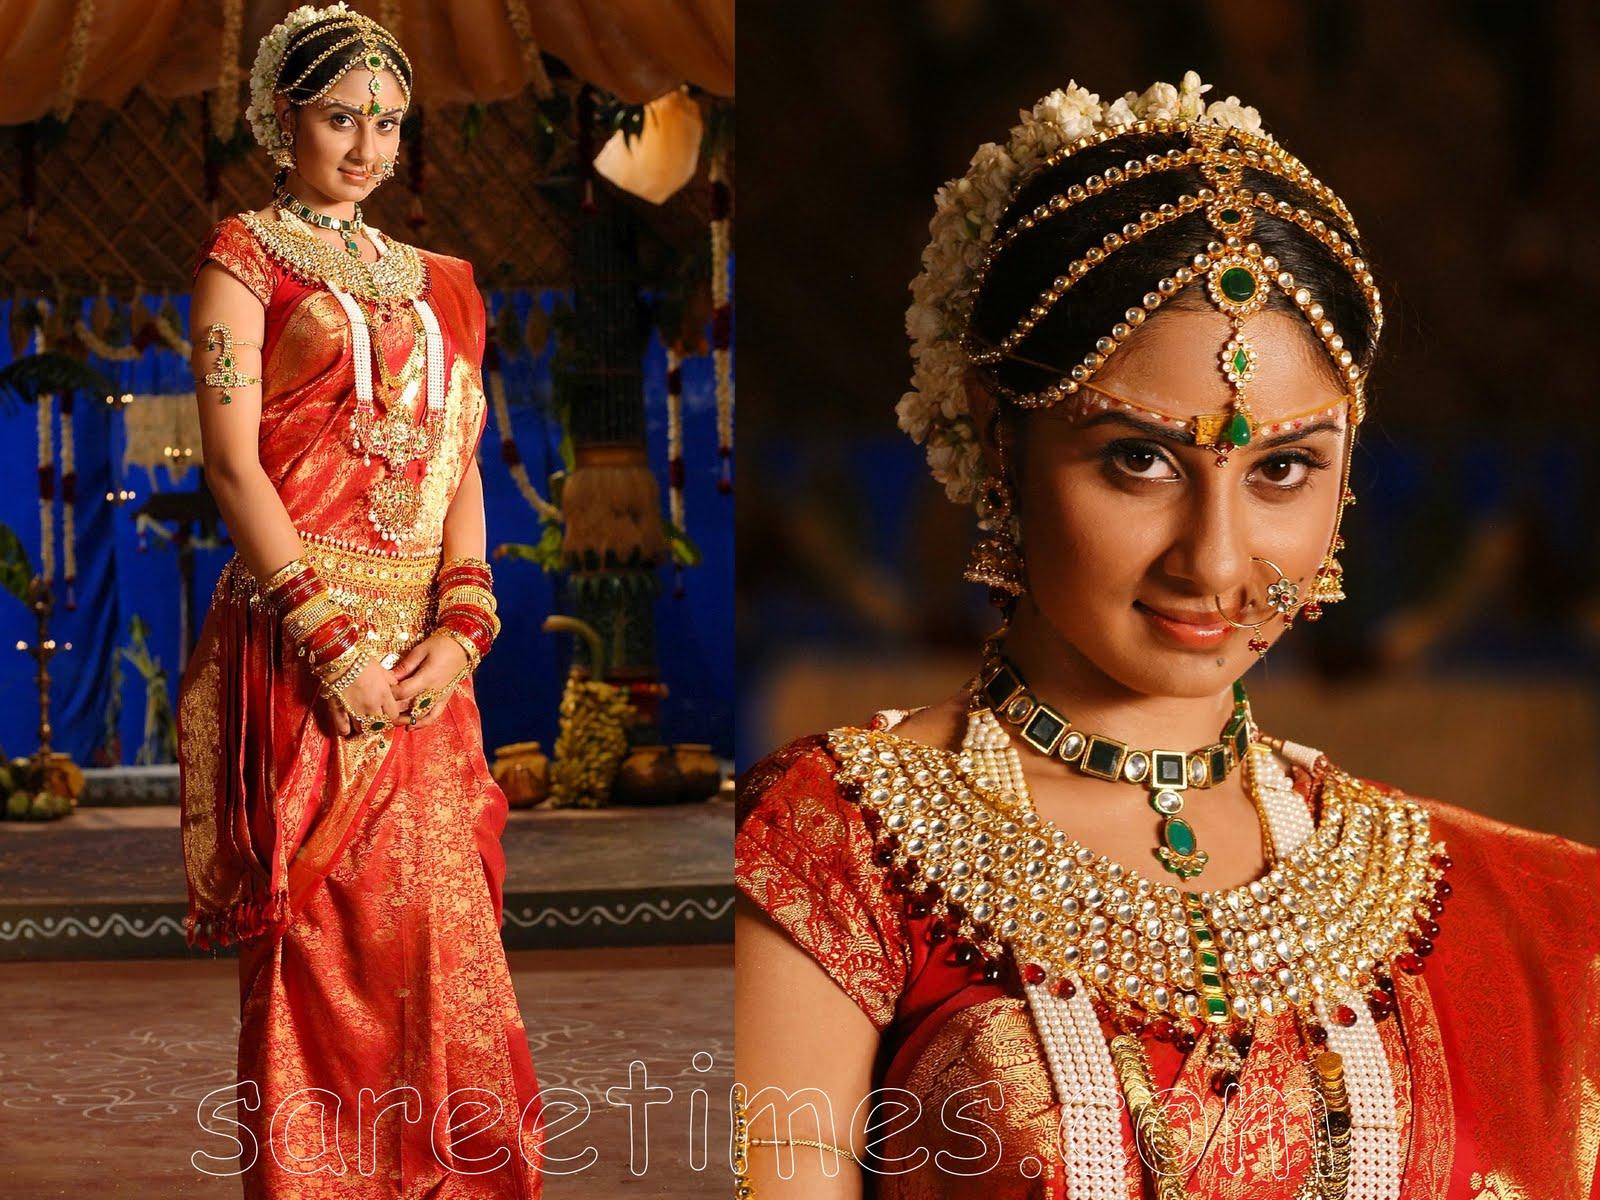 South Indian Bridal Jewellery Setpakistani Make Uppakistani Wearindian Bridalpakistani Wedding